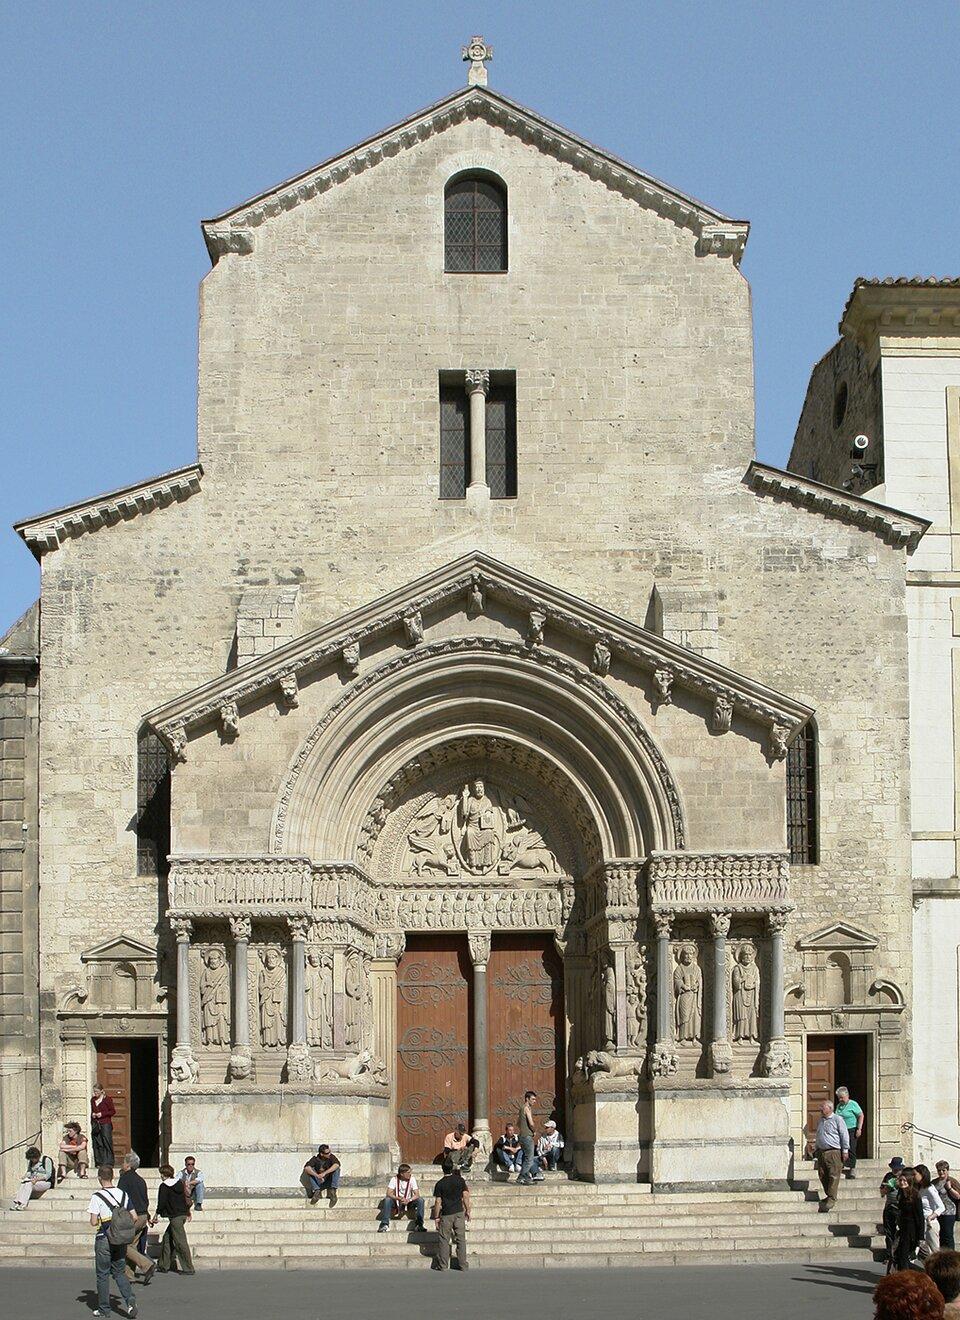 Arles, St. Trophime Źródło: Hans Peter Schaefer, Arles, St. Trophime, licencja: CC BY-SA 3.0.